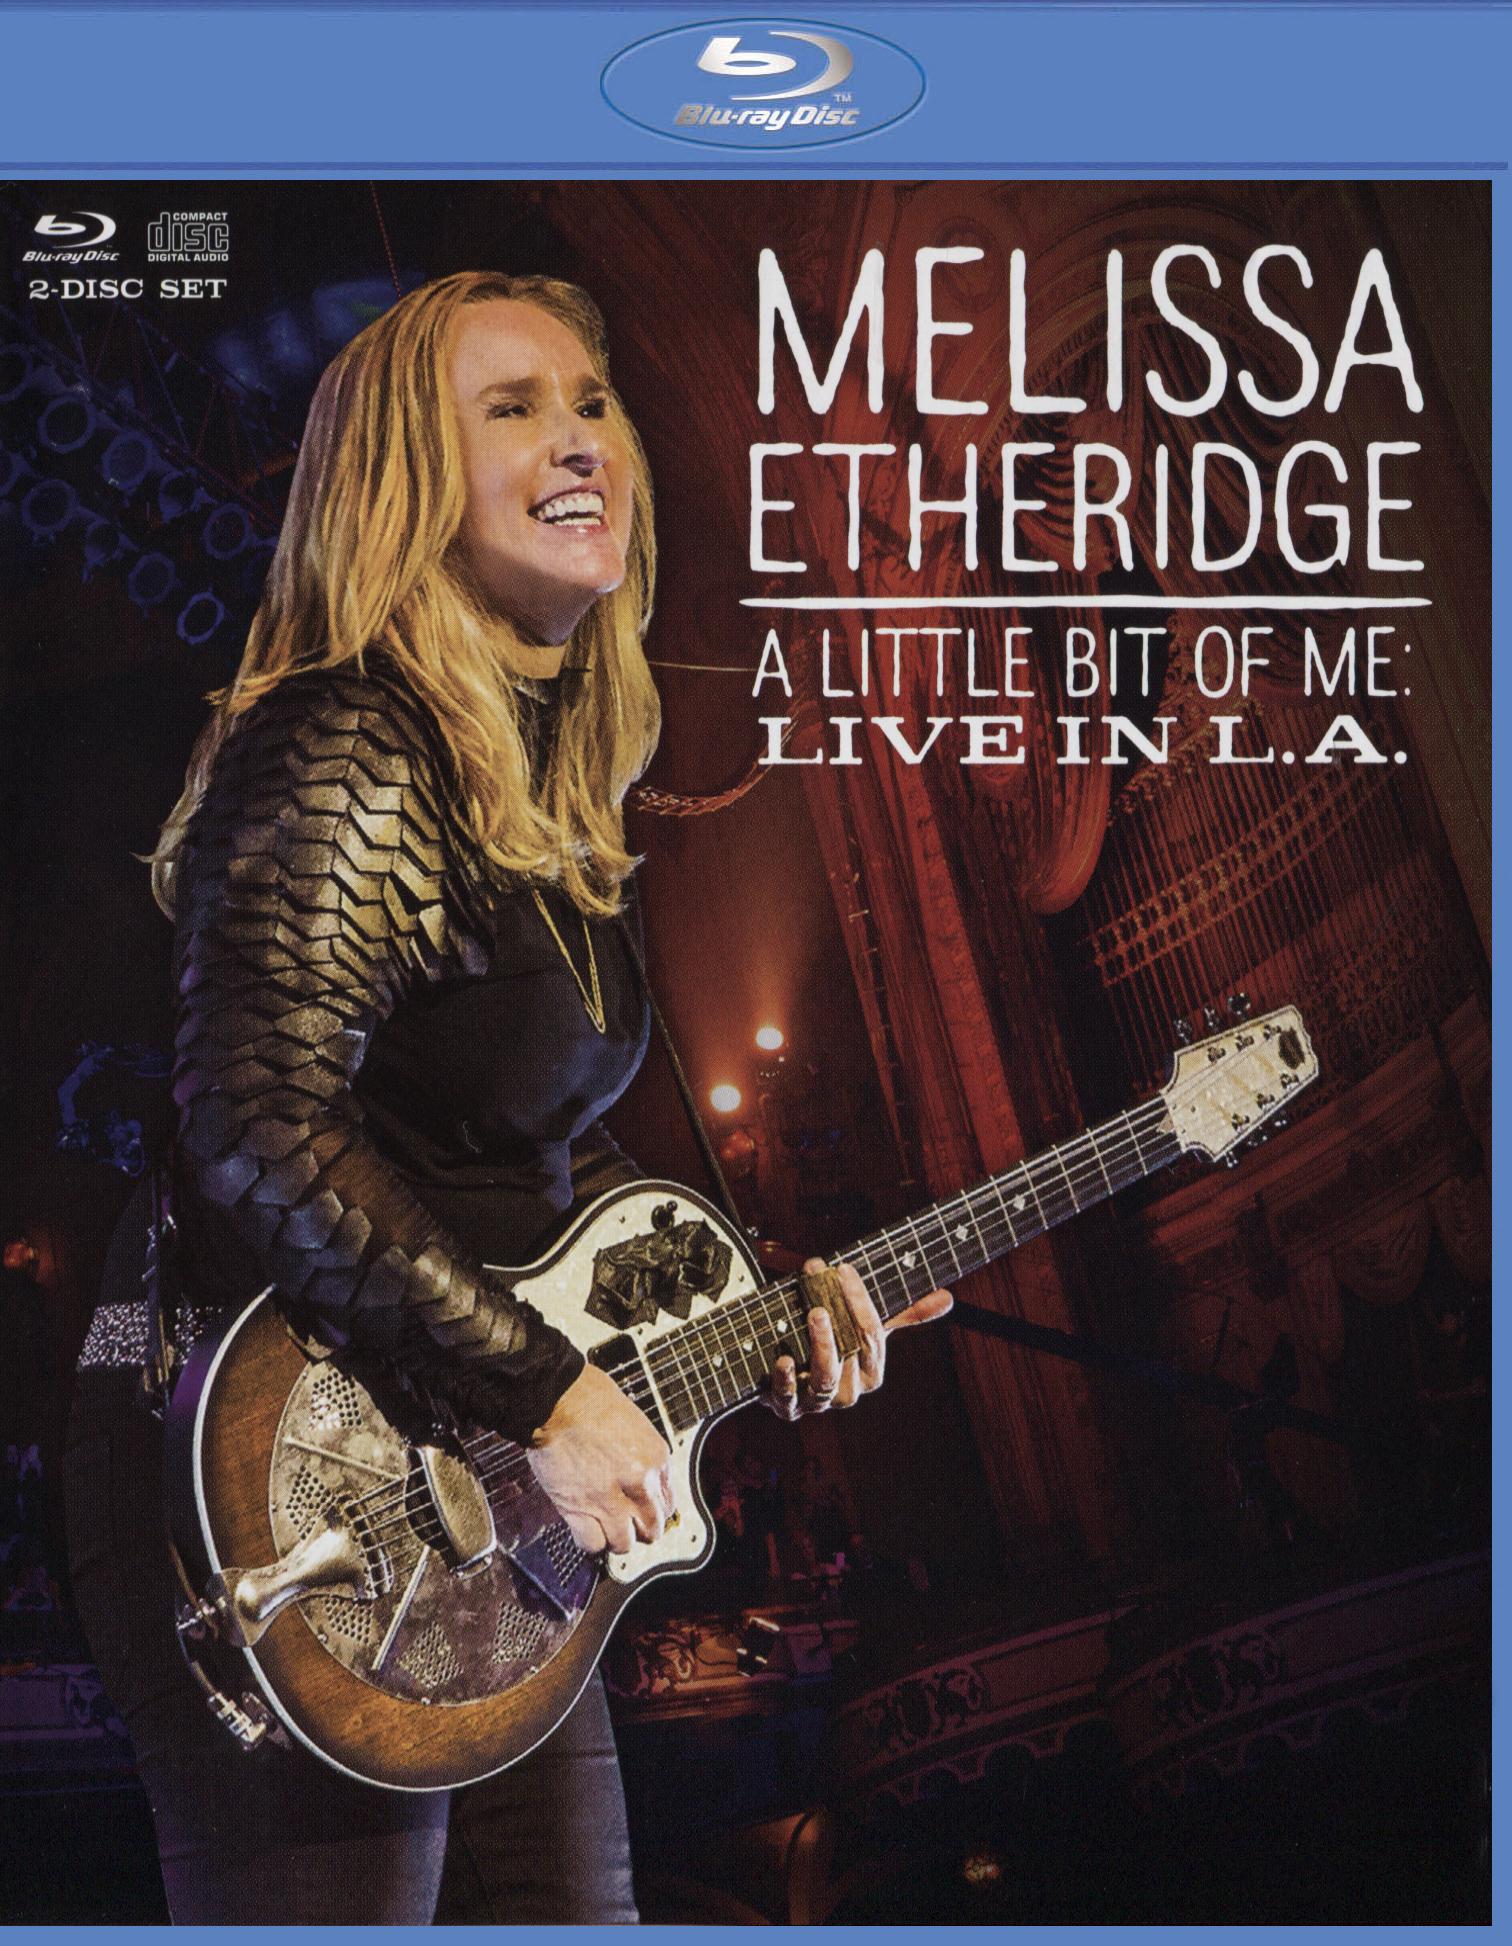 Melissa Etheridge: A Little Bit of Me - Live in L.A.